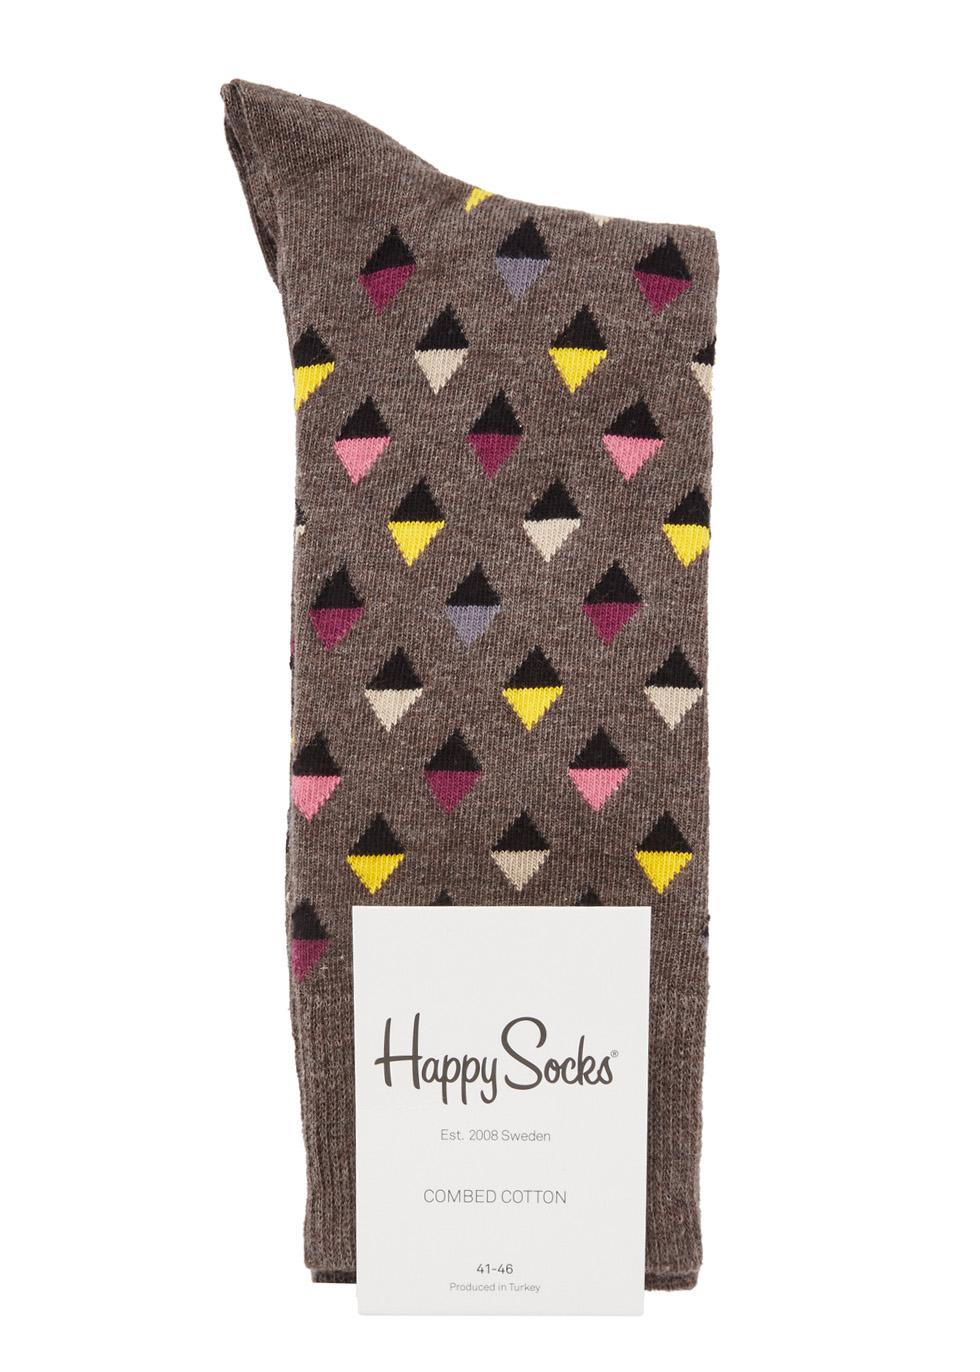 Diamond cotton blend socks - Happy Socks